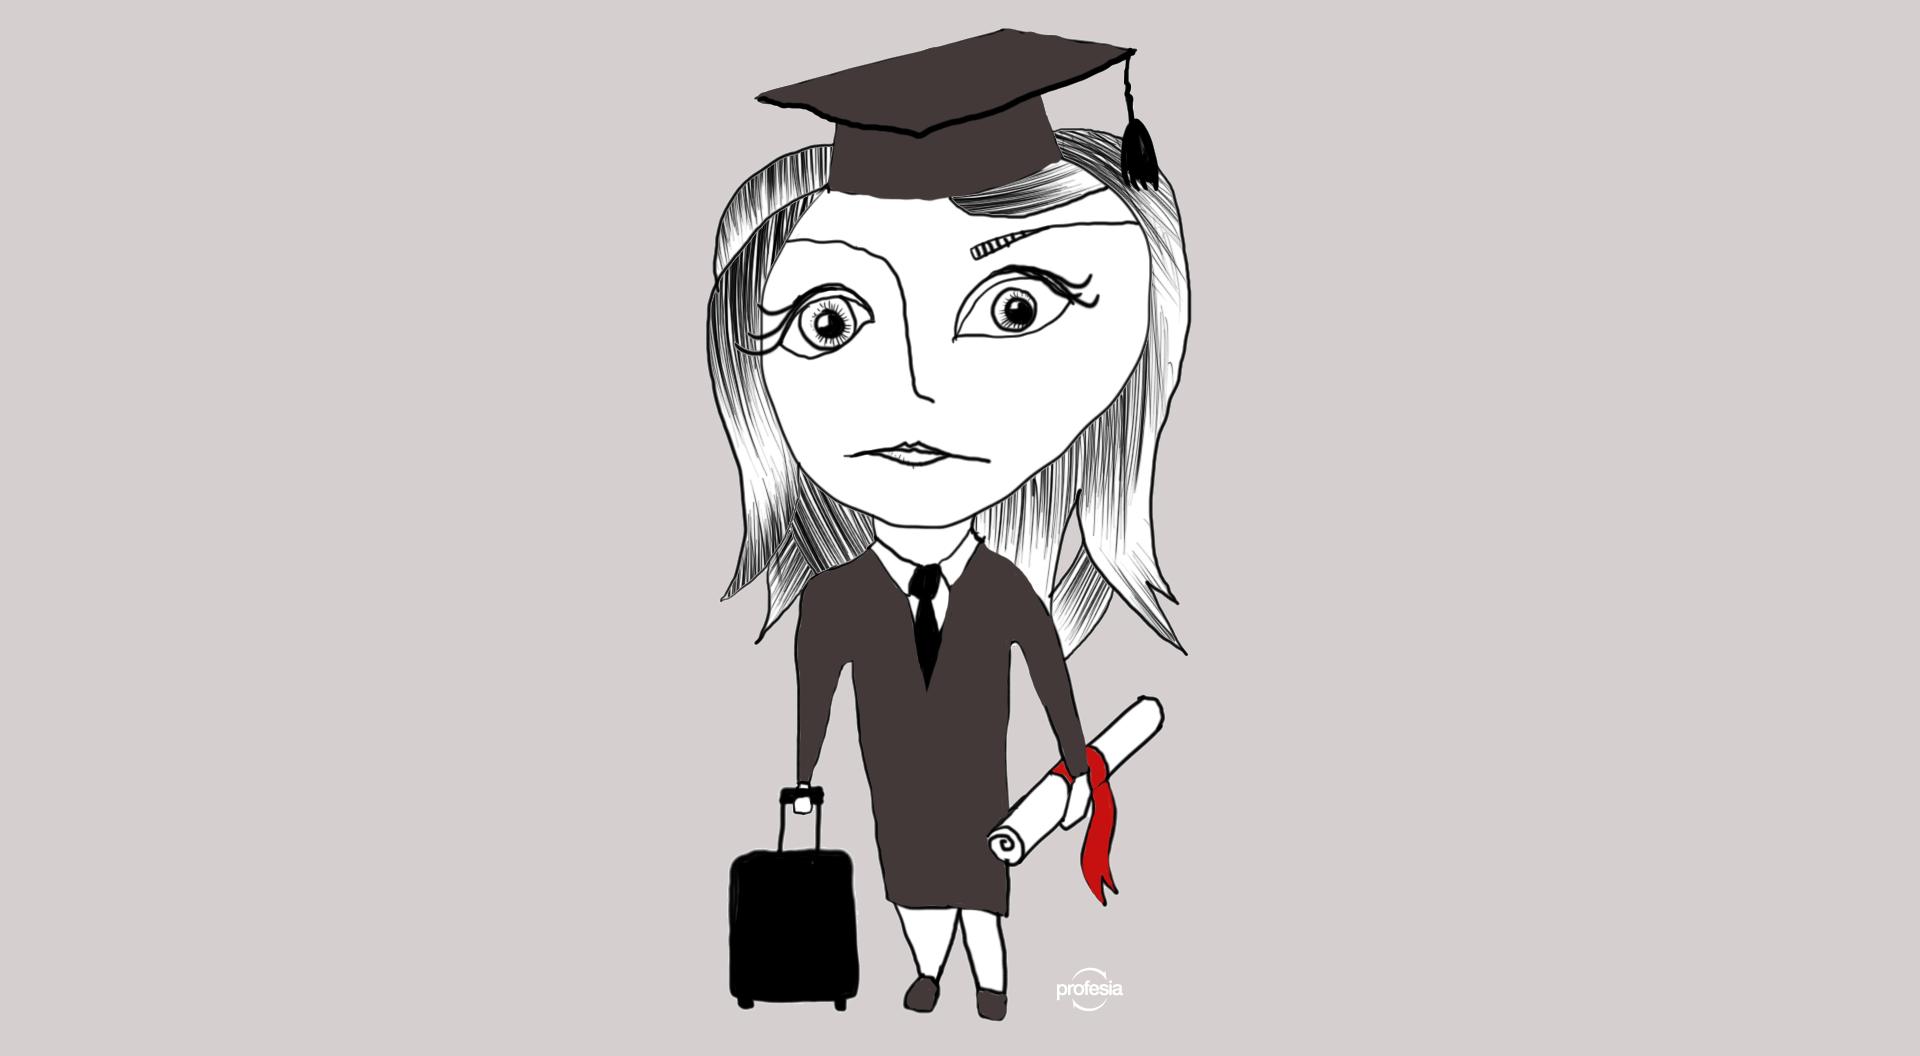 absolventi, Profesia, odchod, brain drain